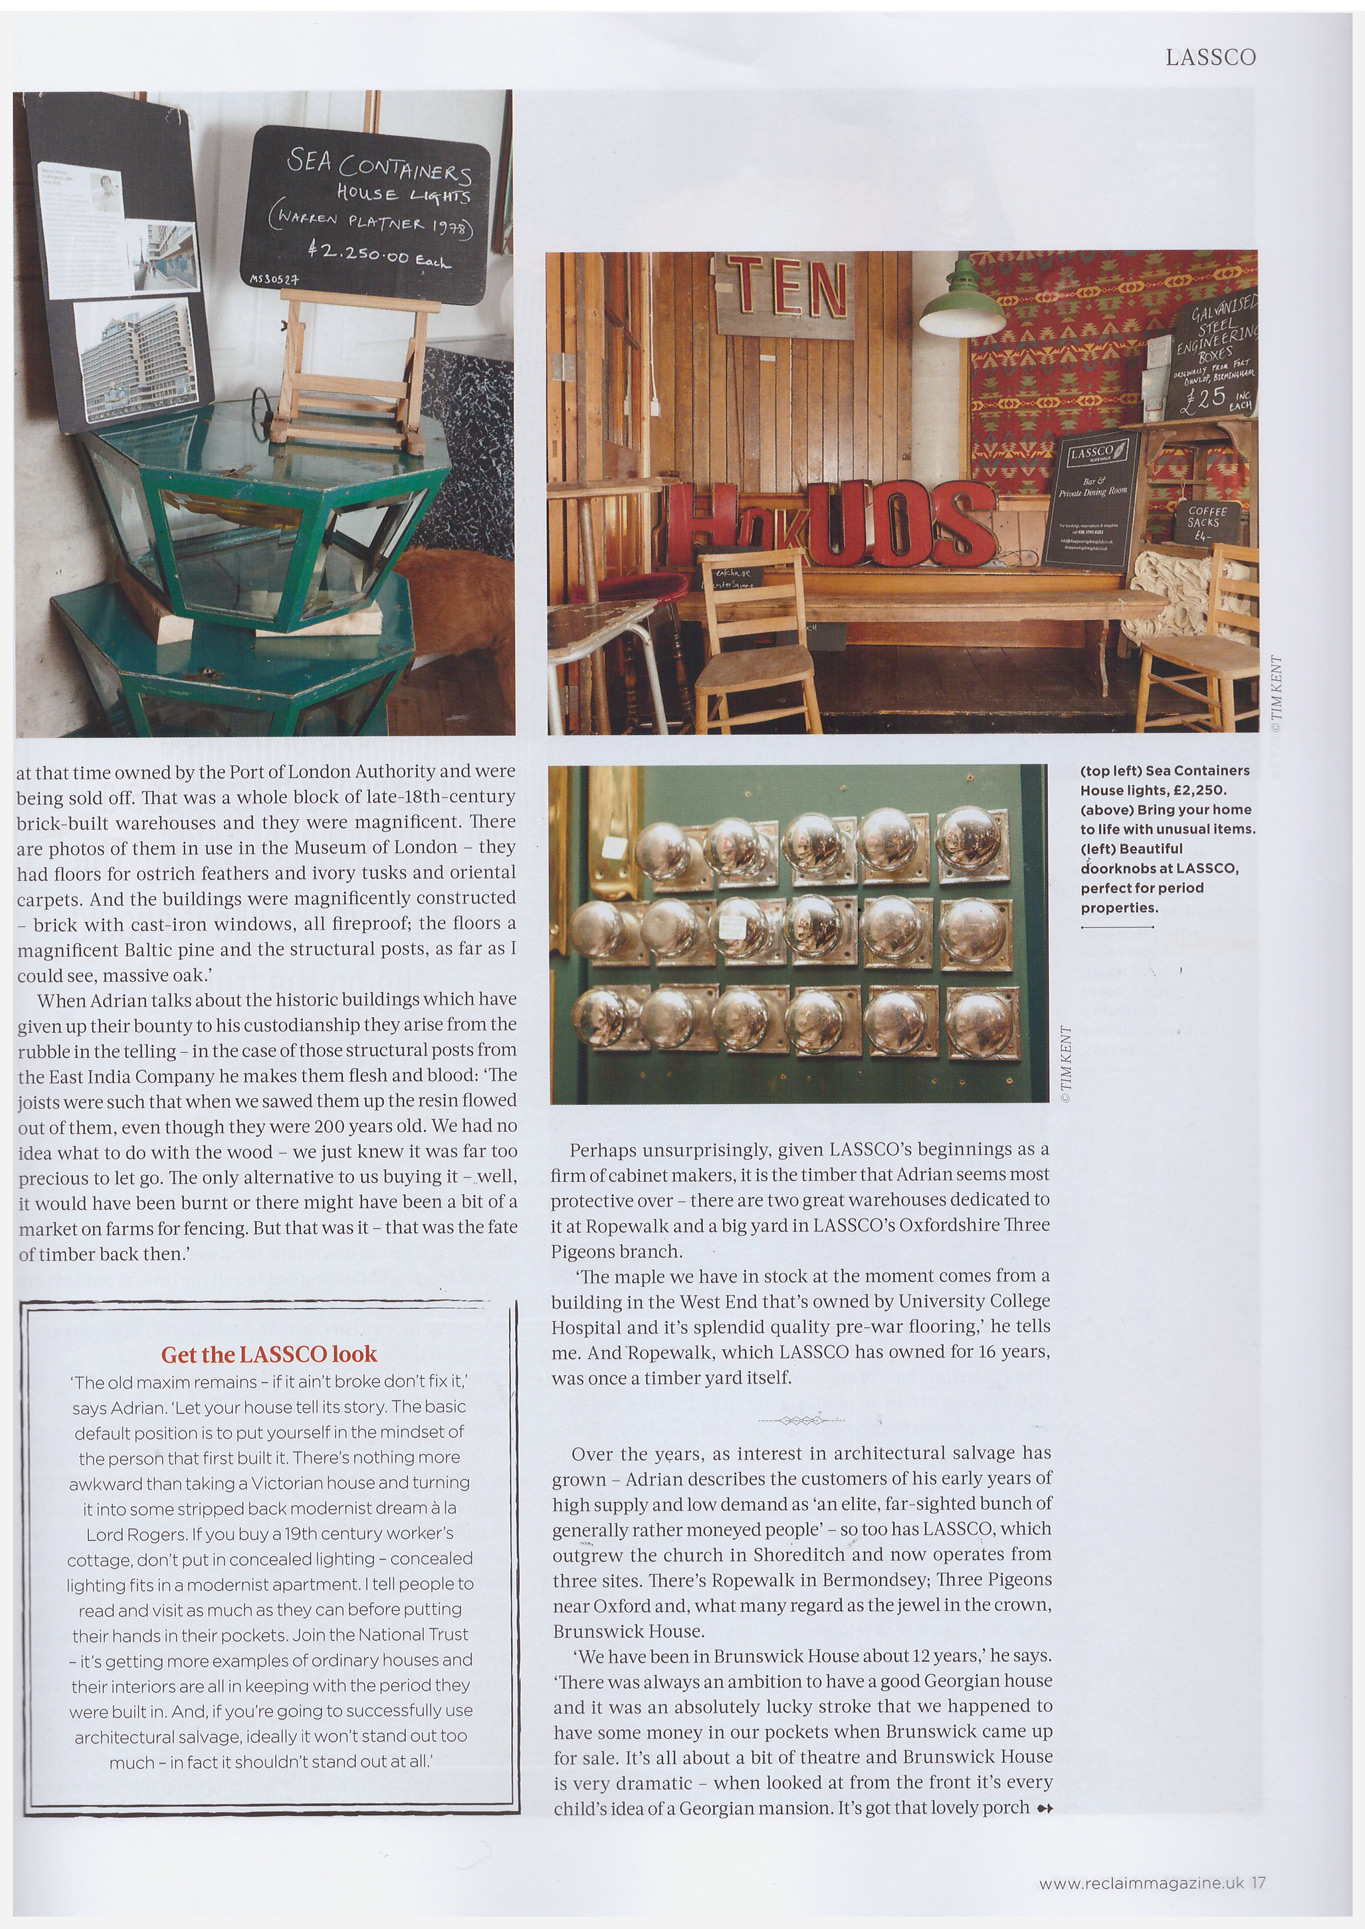 Reclaim-magazine-pg-17-web